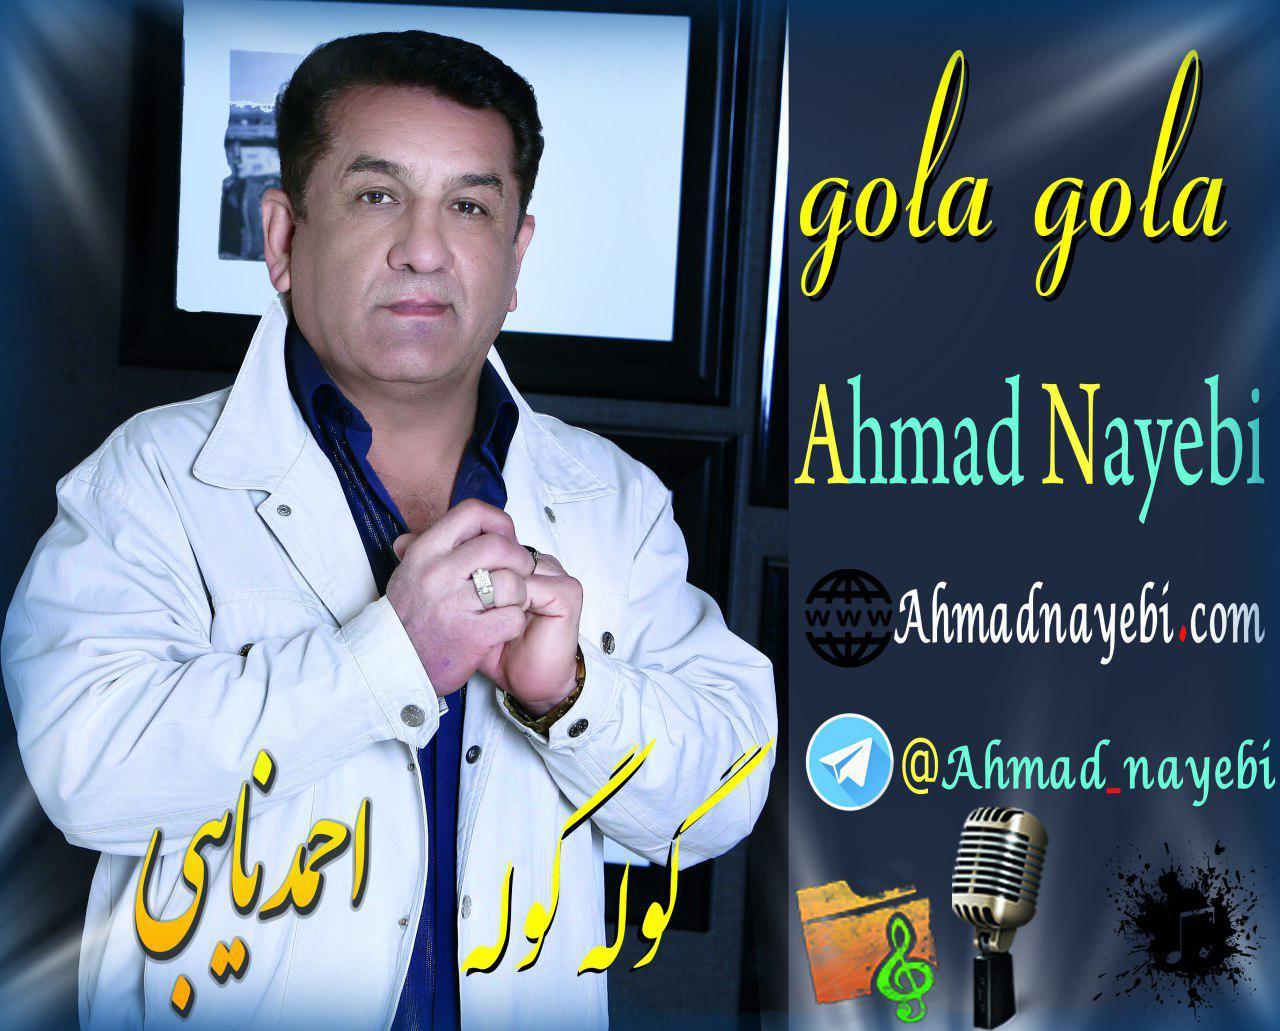 http://s8.picofile.com/file/8297927084/01AHMAD_Nayebi_Gule_Gule.jpg